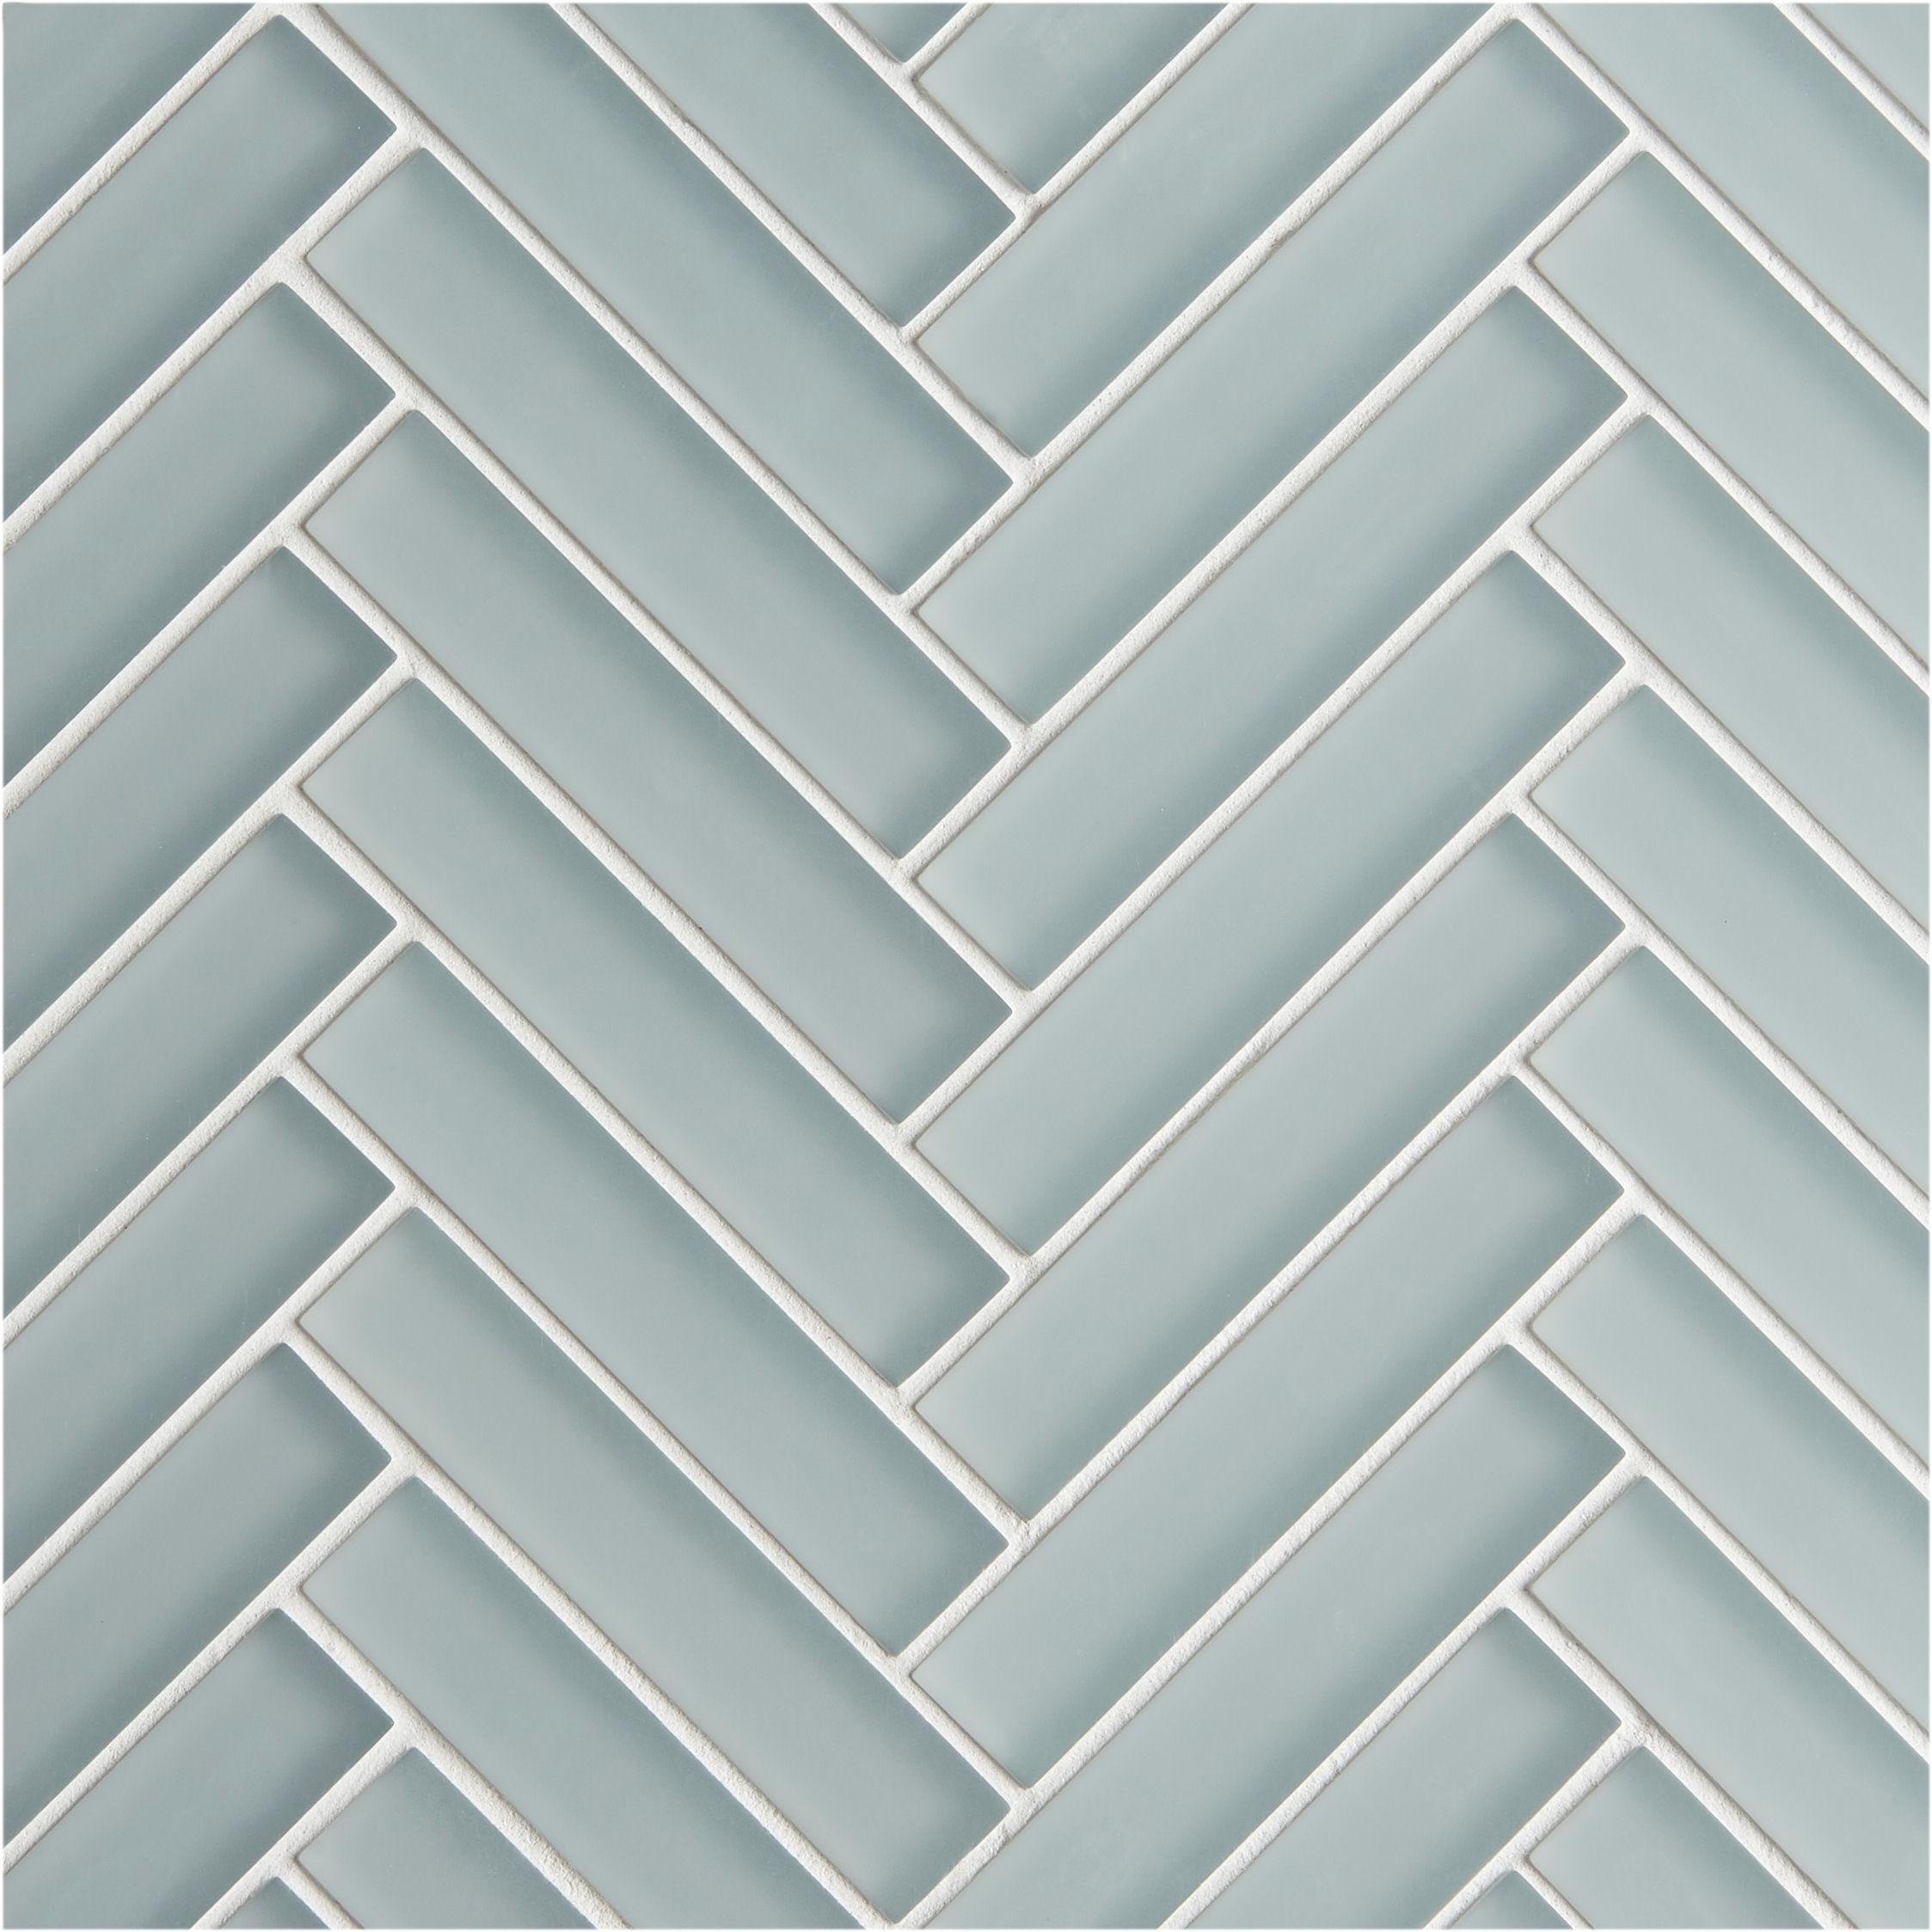 Glacier Grey Gl Herringbone Mosaic